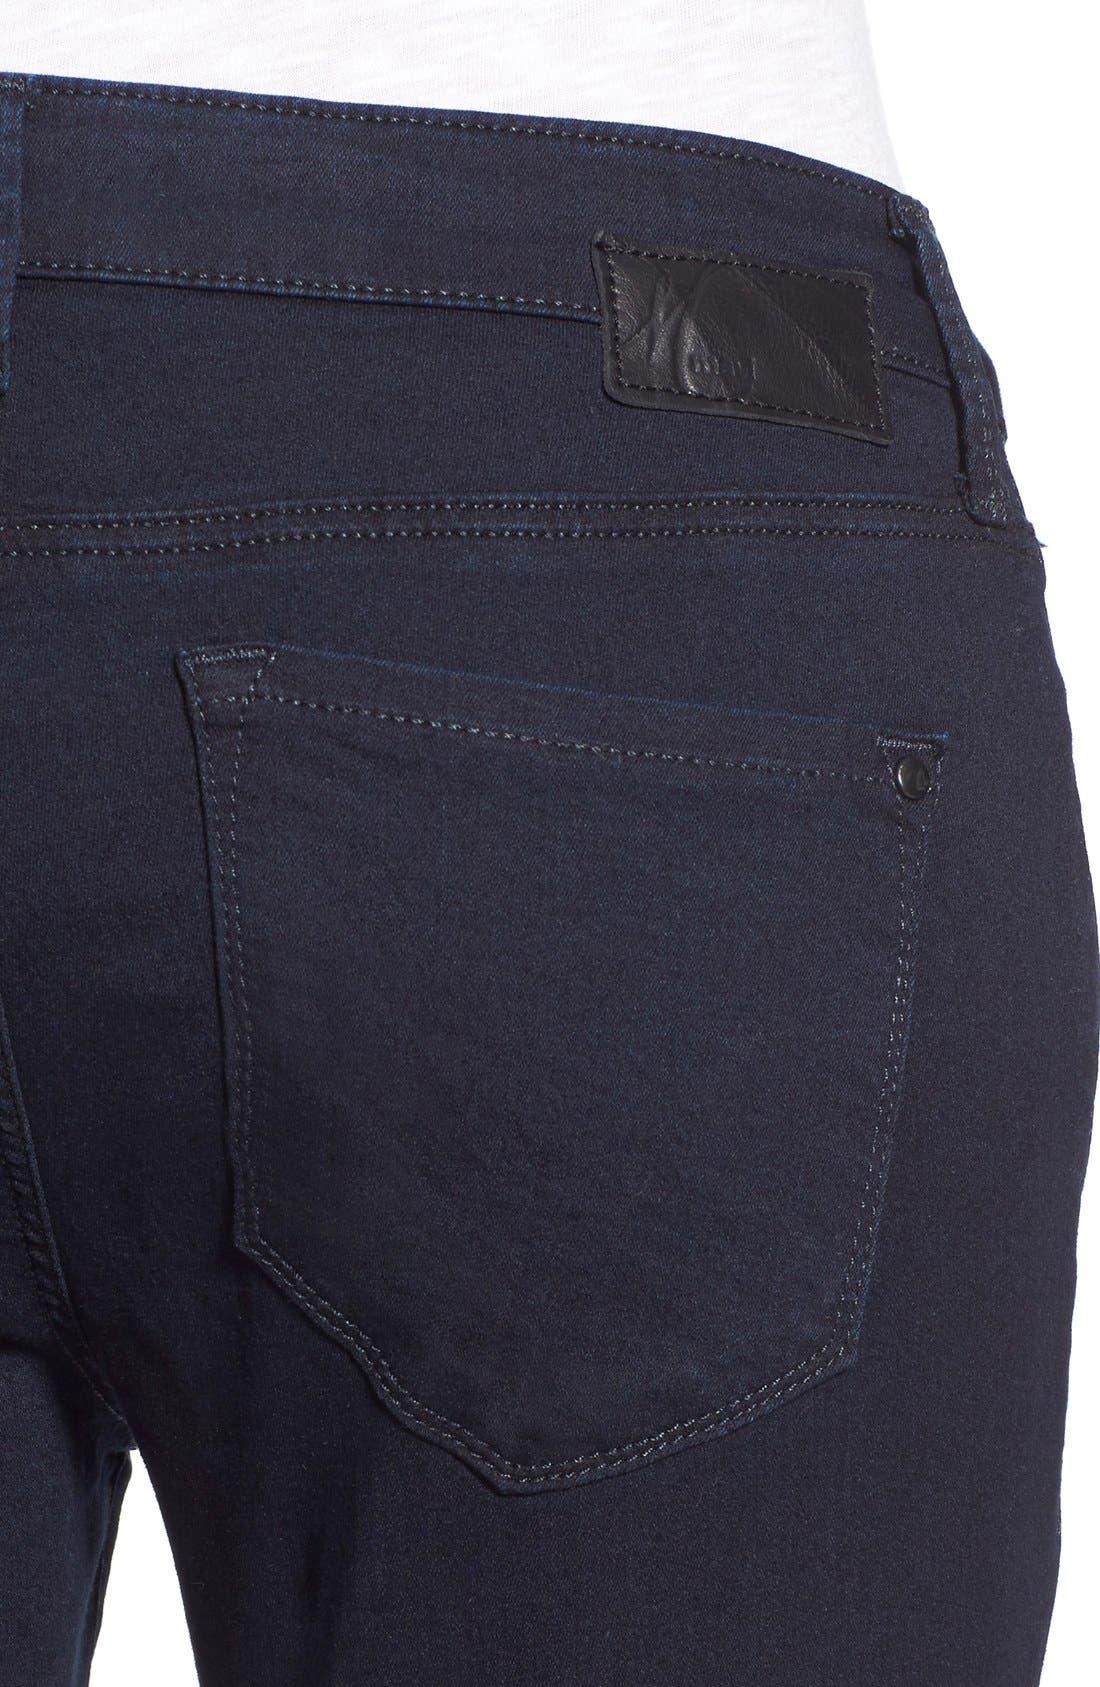 Alternate Image 4  - Mavi Jeans 'Alexa' Stretch Skinny Jeans (Dark Shanti) (Petite)